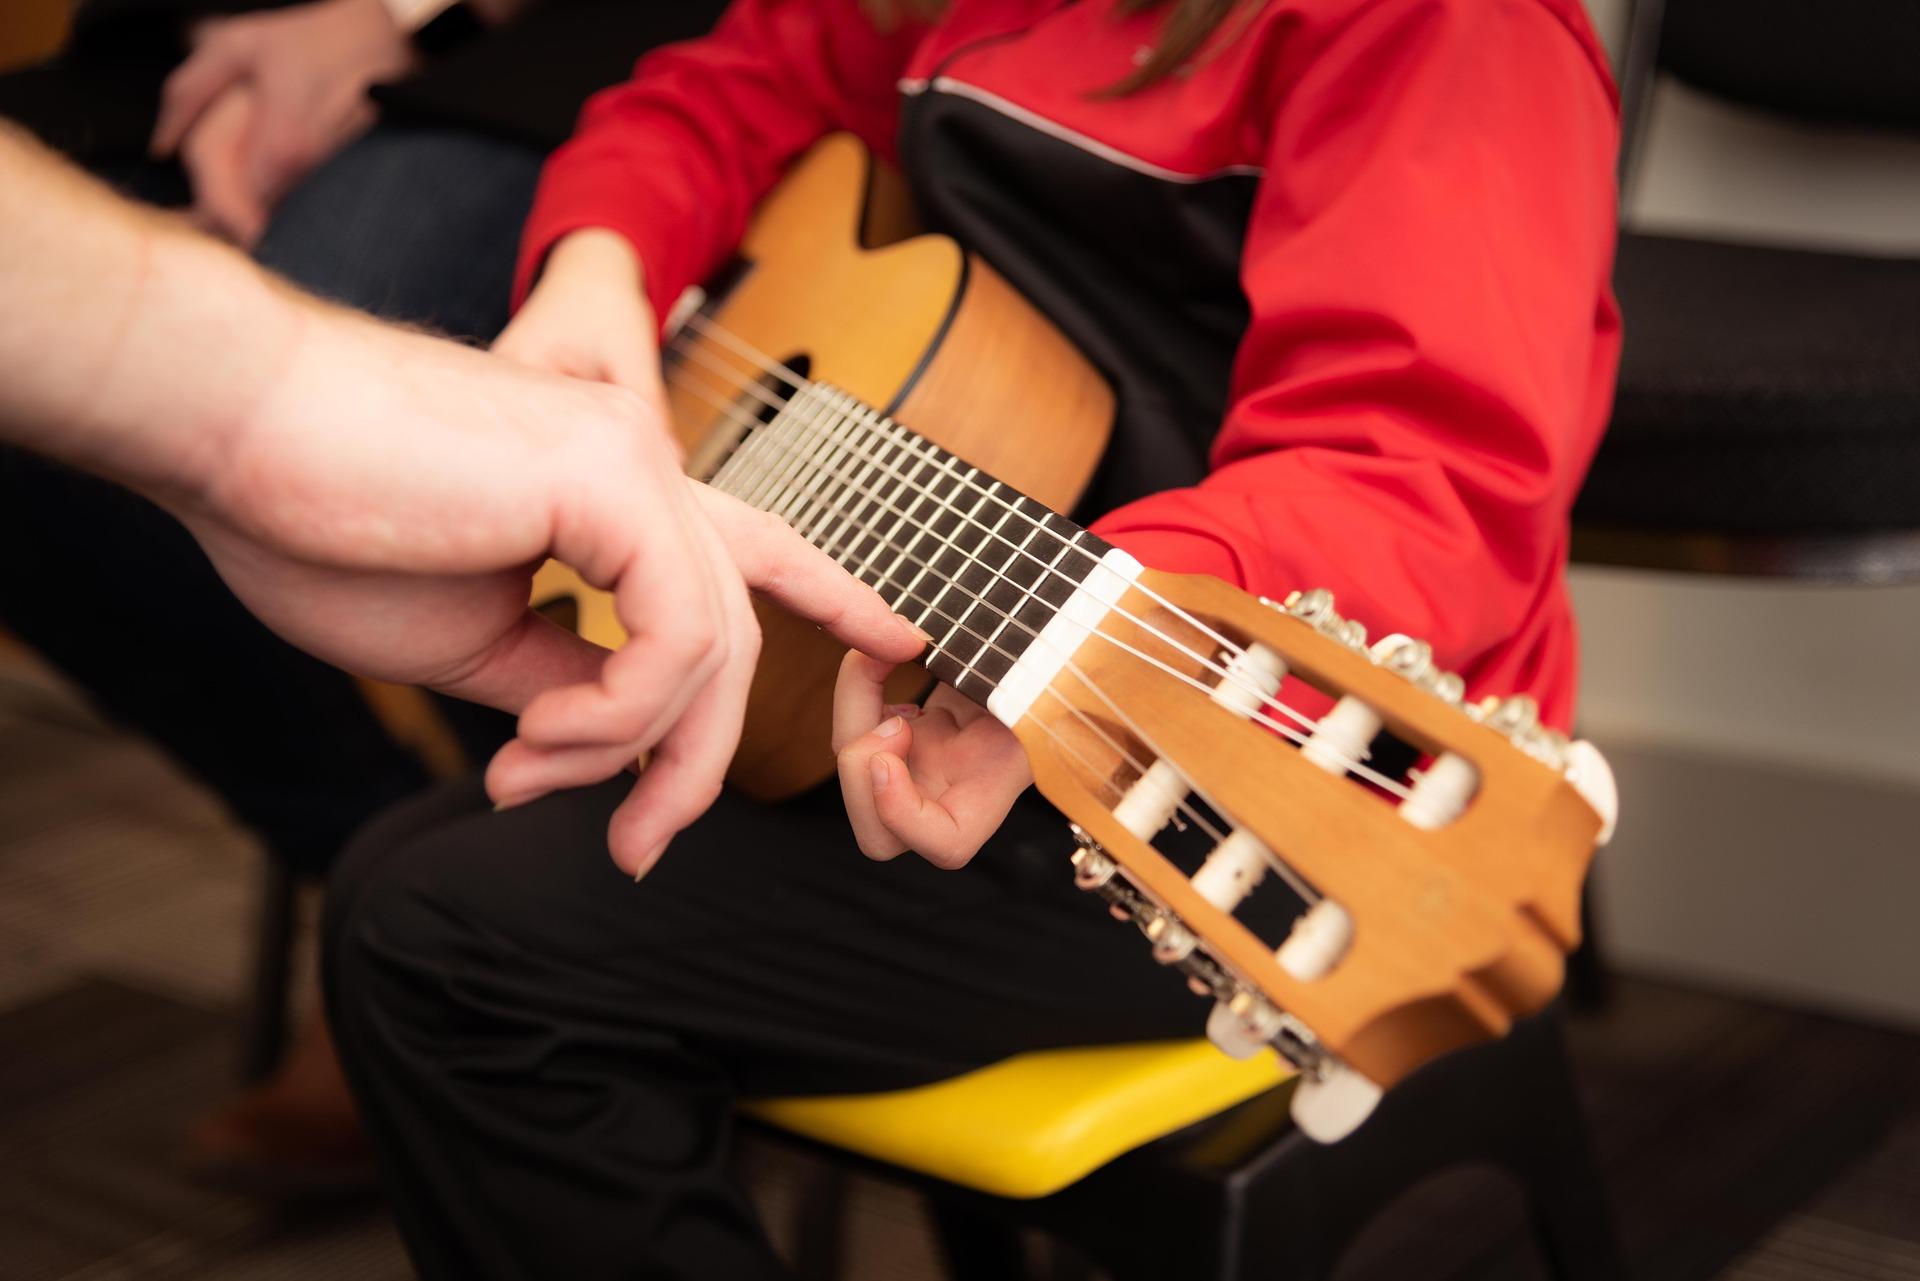 Kind hält Gitarre